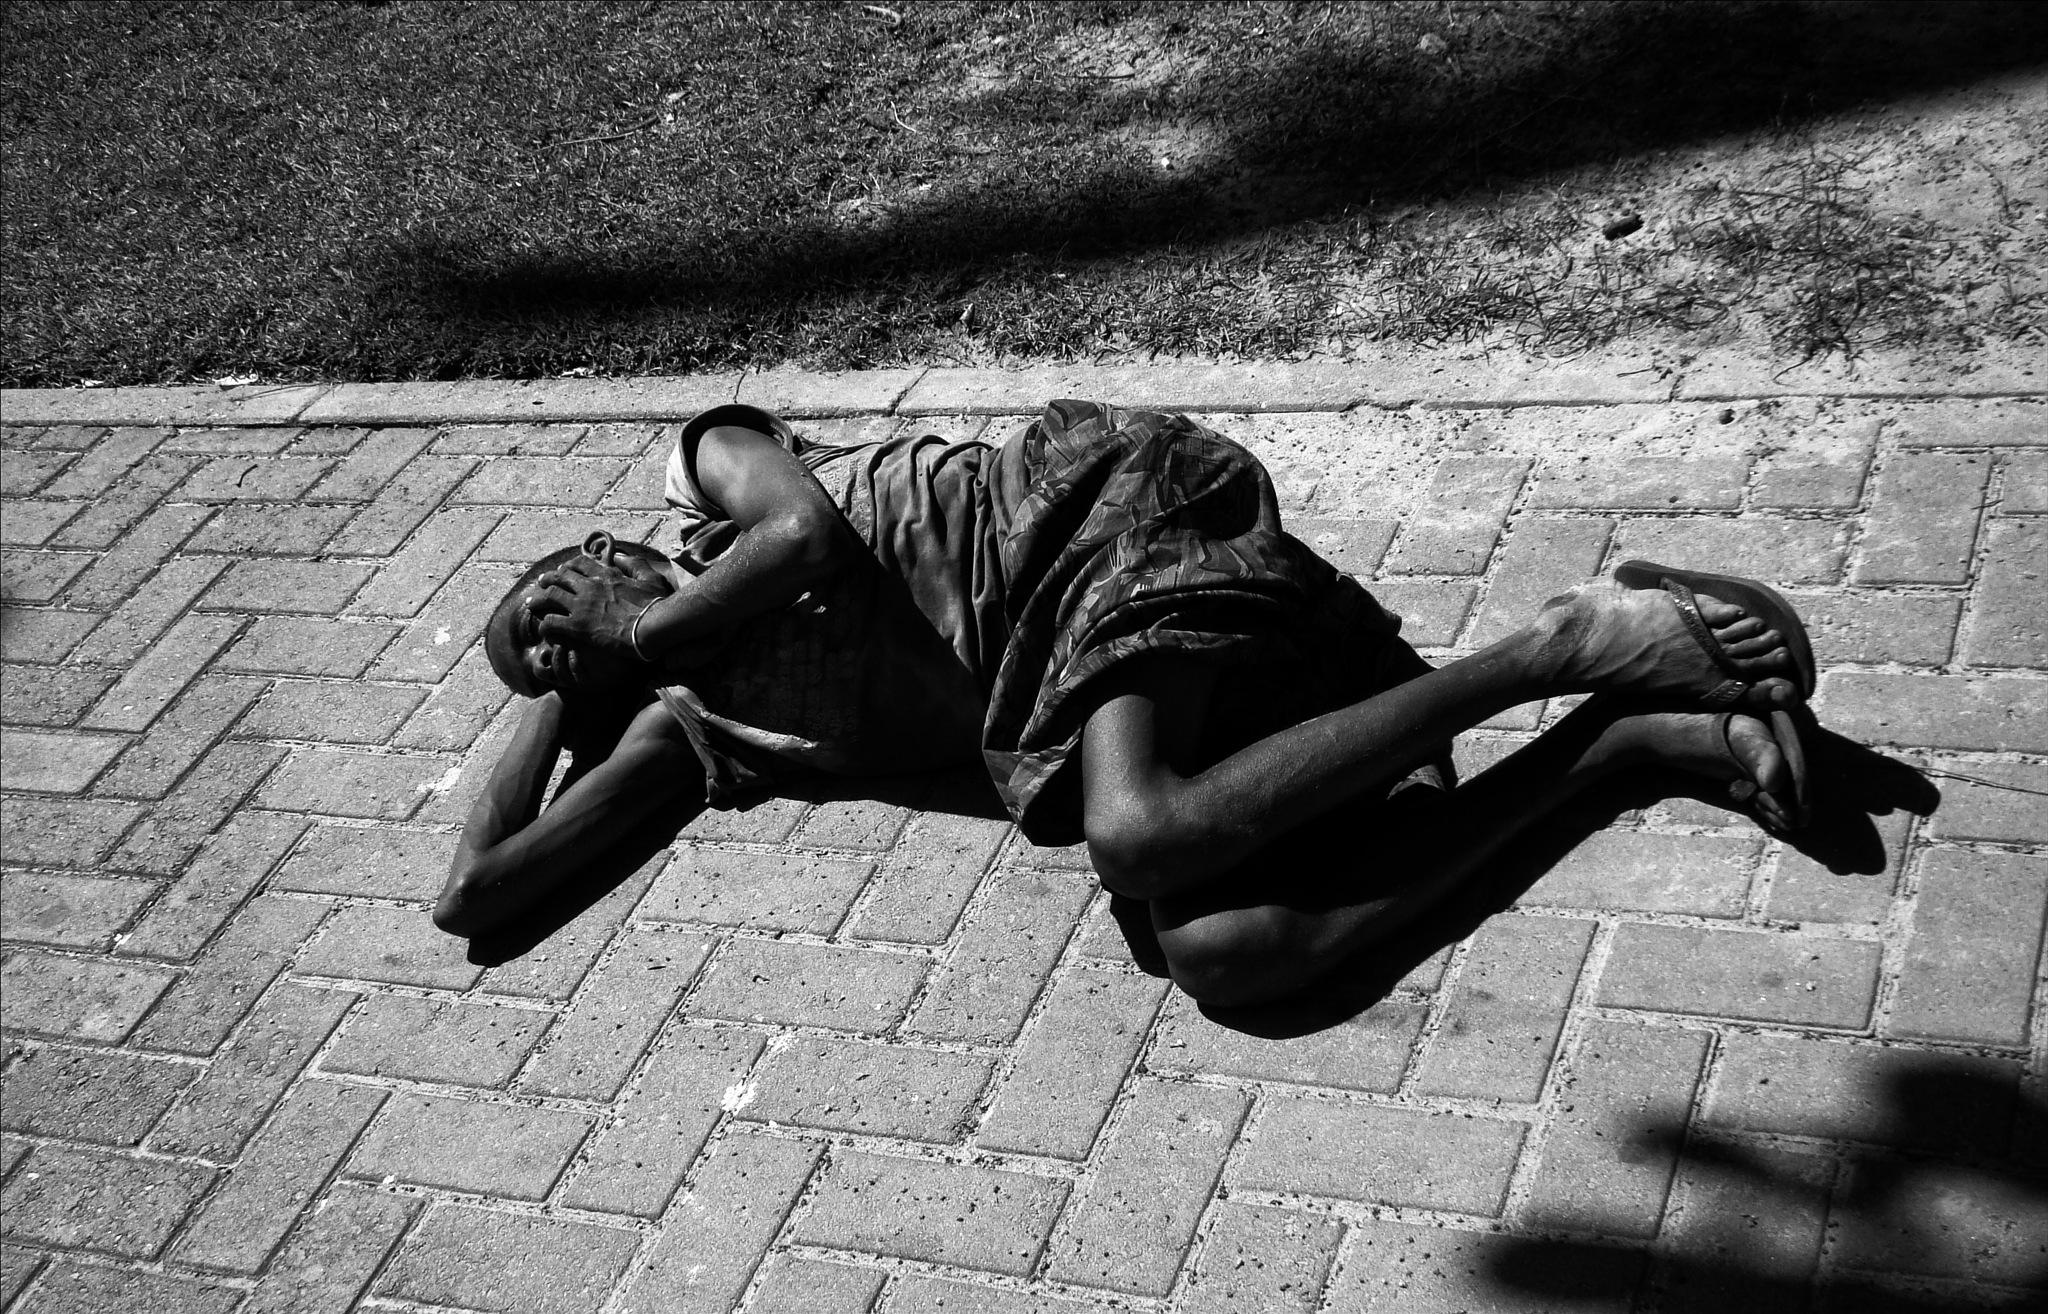 stoned boy sleeping on the sidewalk by Fred Matos